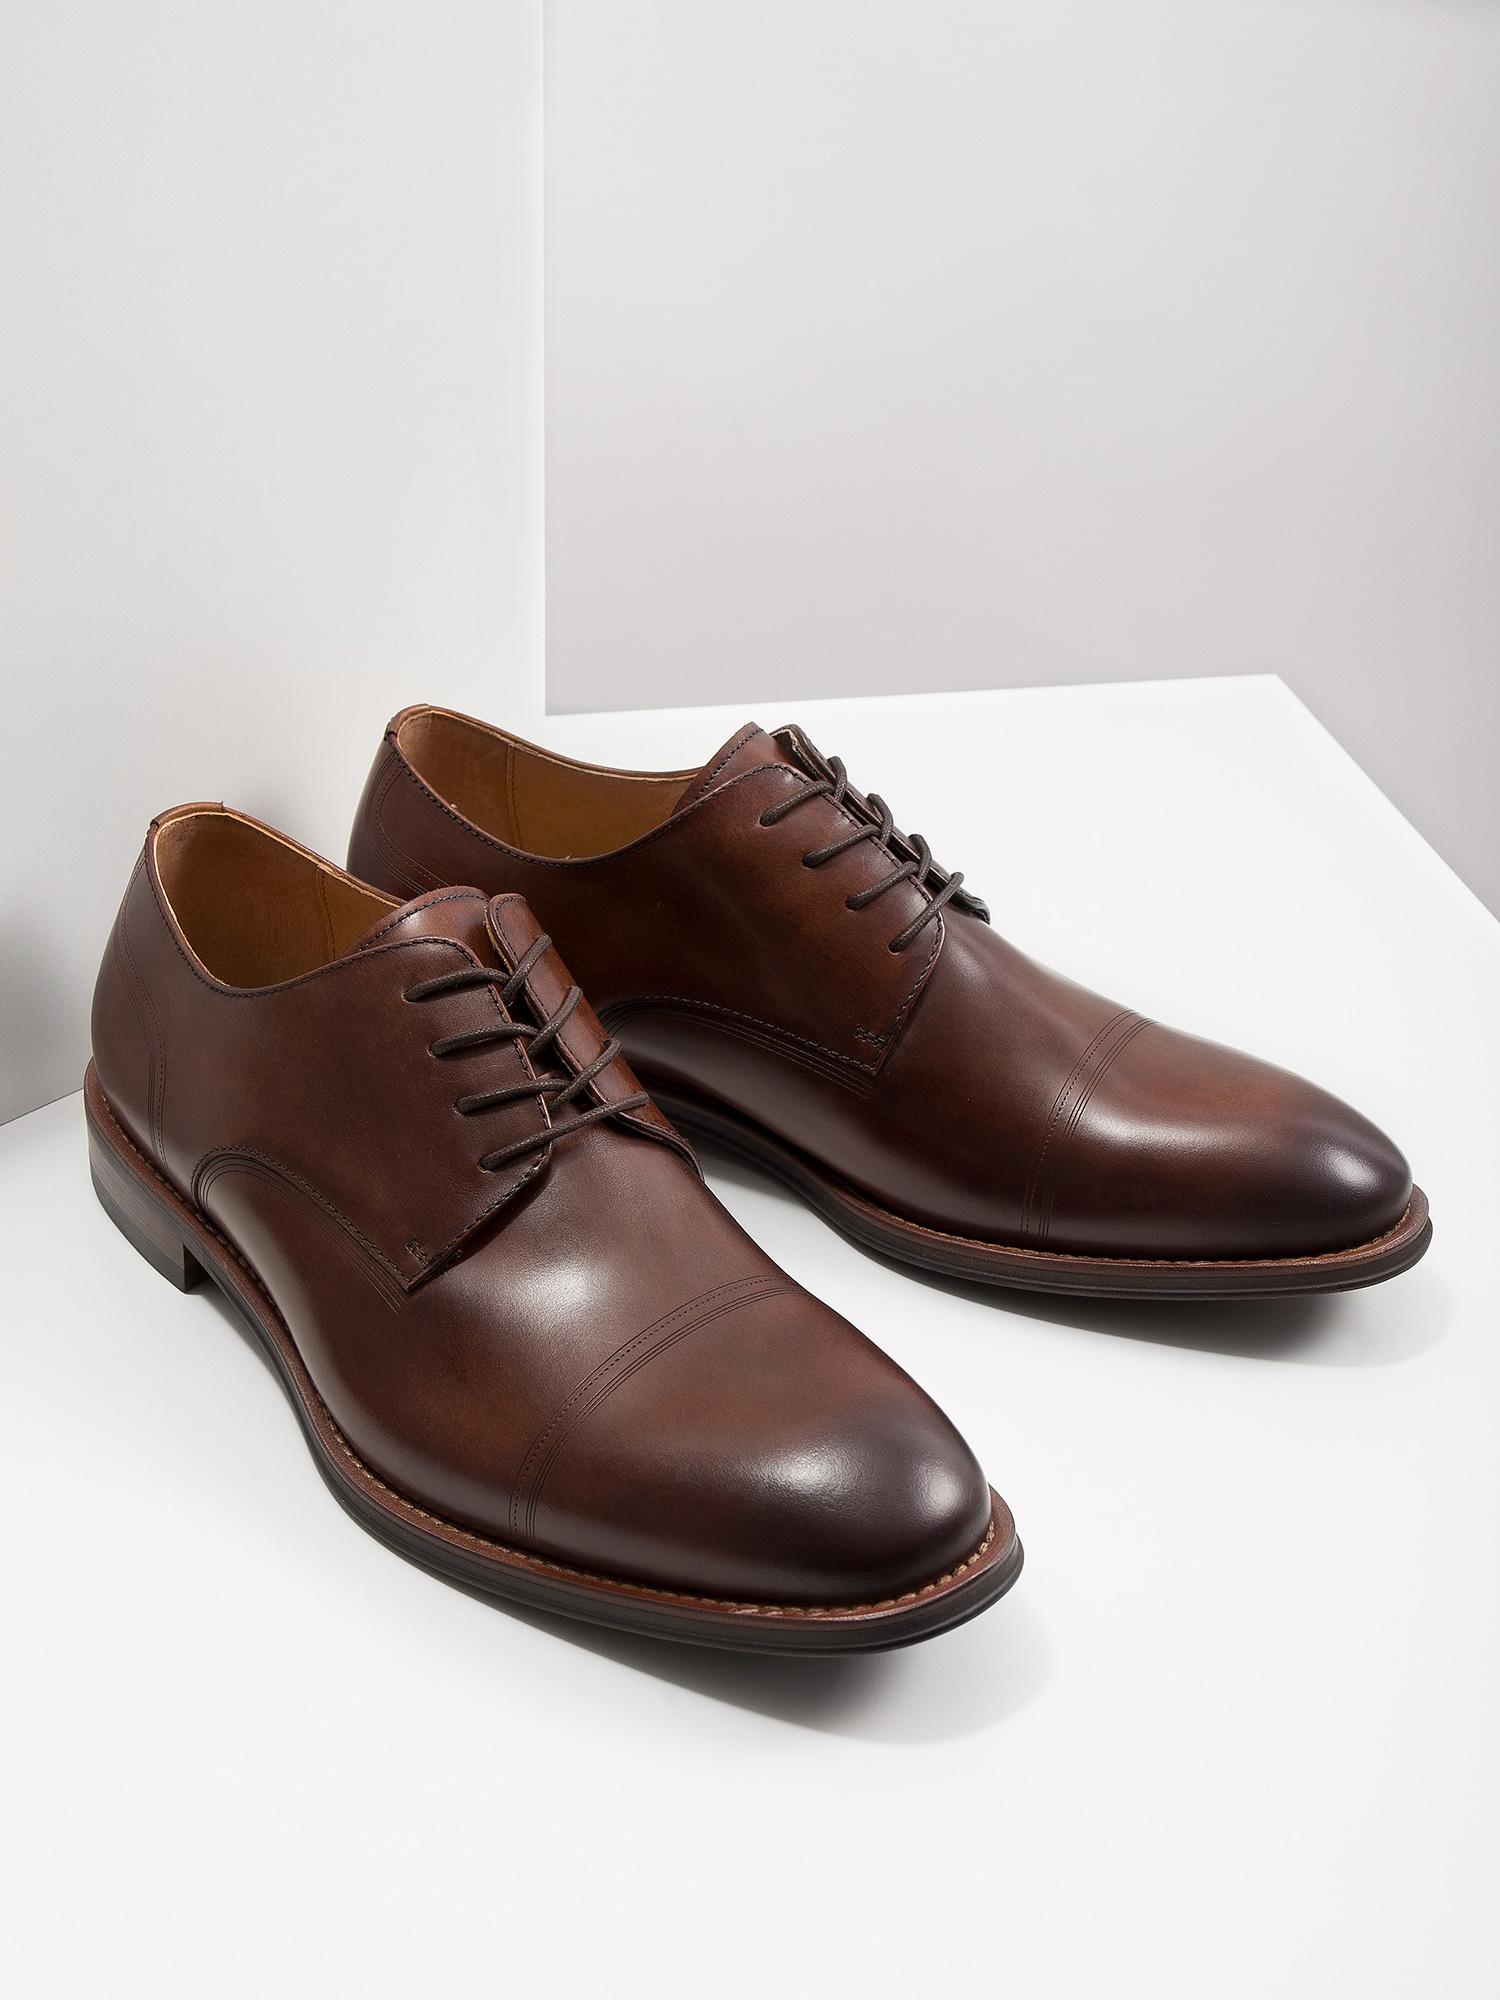 18cb55dc73 ... Men  39 s brown leather shoes bata